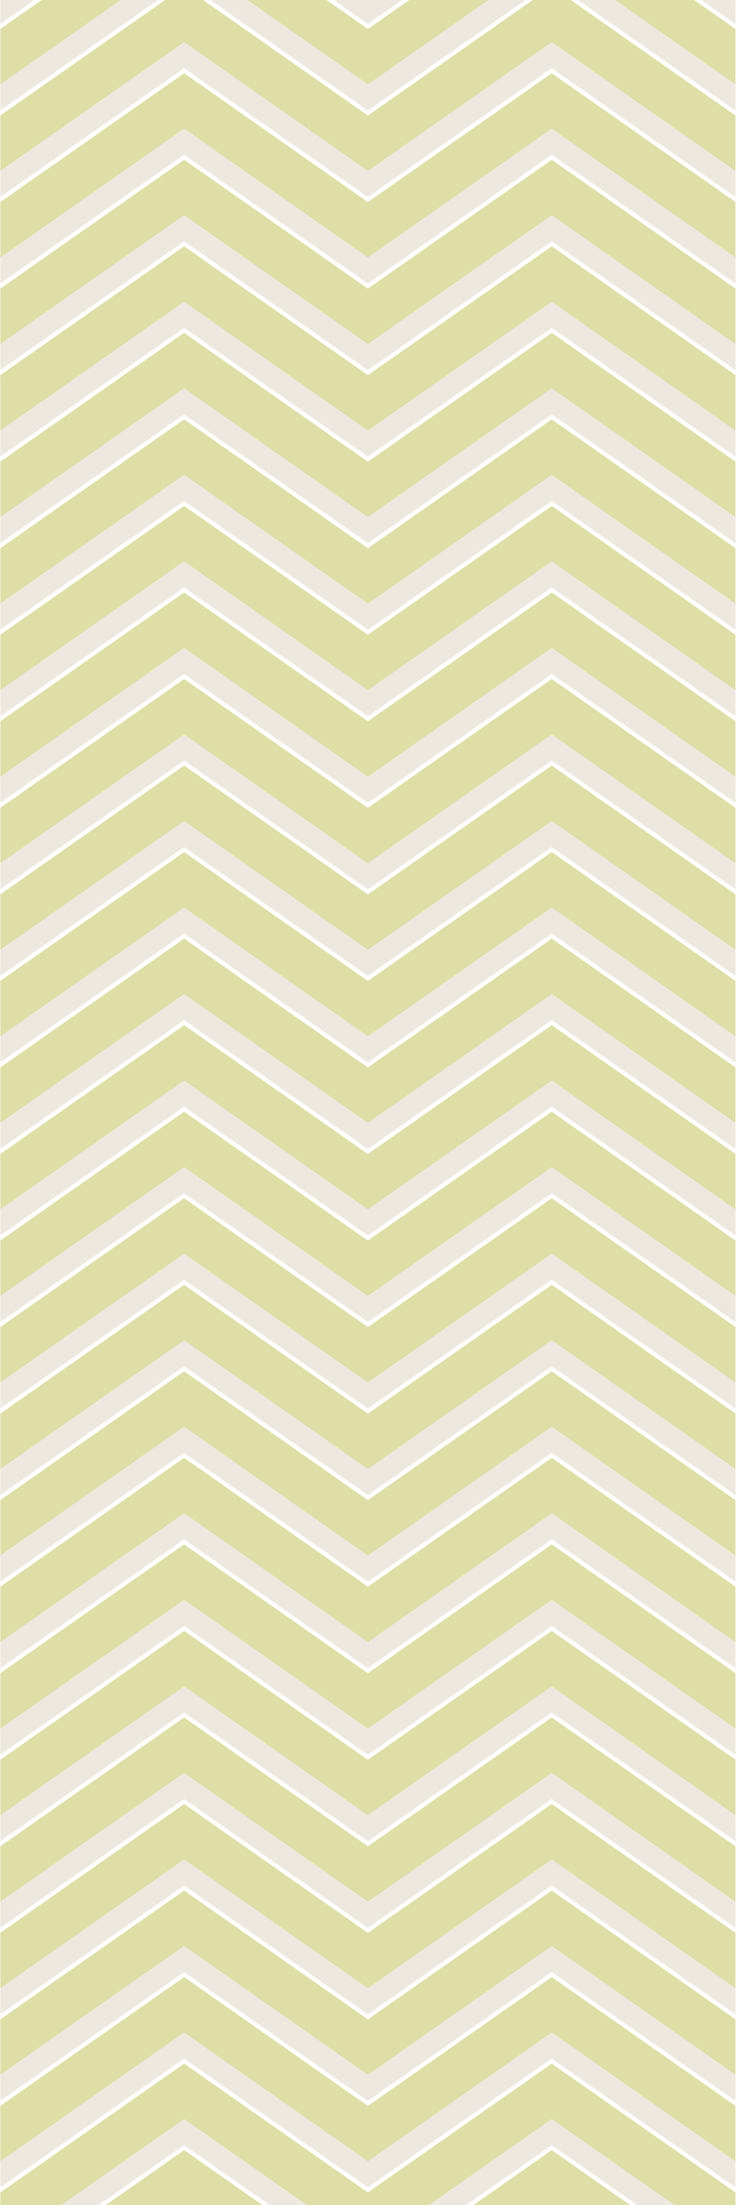 Custom printed Chevron wallpaper from the 'STARLING' colour range #chevron #wallpaper #muurgraphics